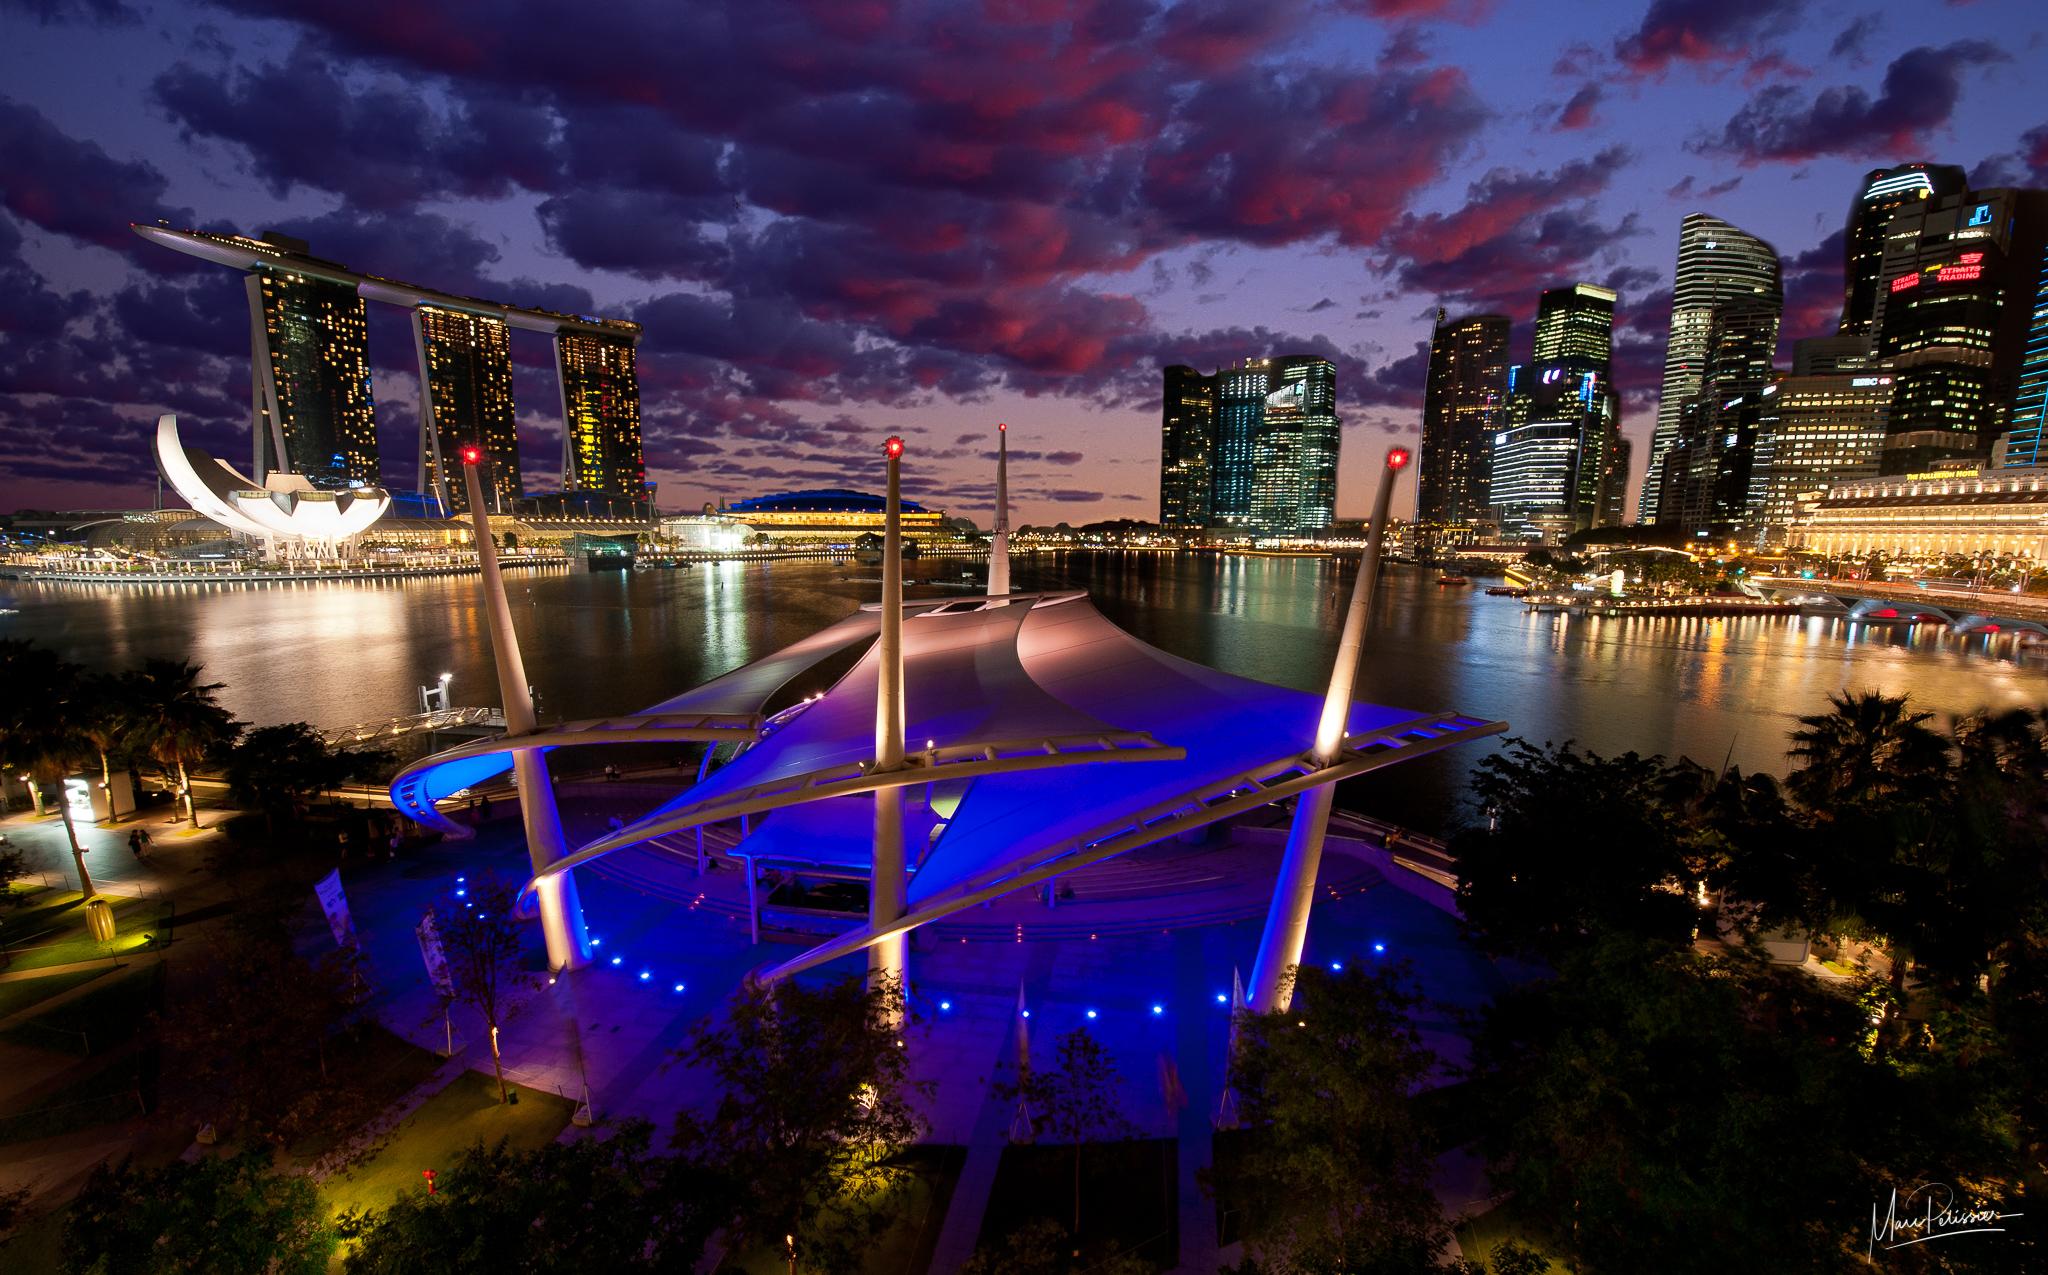 Marina Bay sand view from theater platform, Singapore